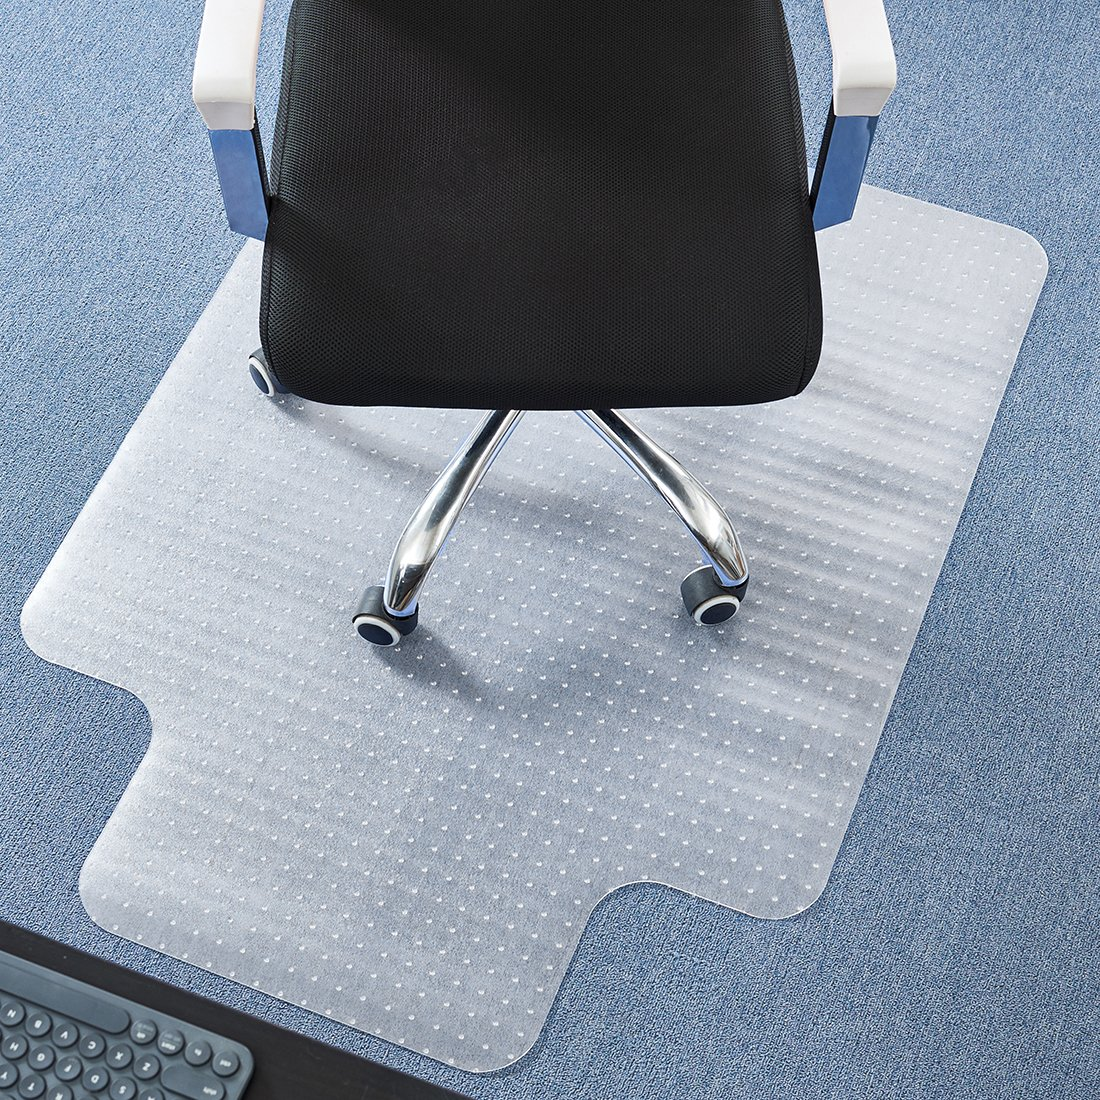 DAVID.ANN 36'' x 48'' Vinyl (PVC) Lipped Chair Mat for Very Low Pile Carpets (Transparent)